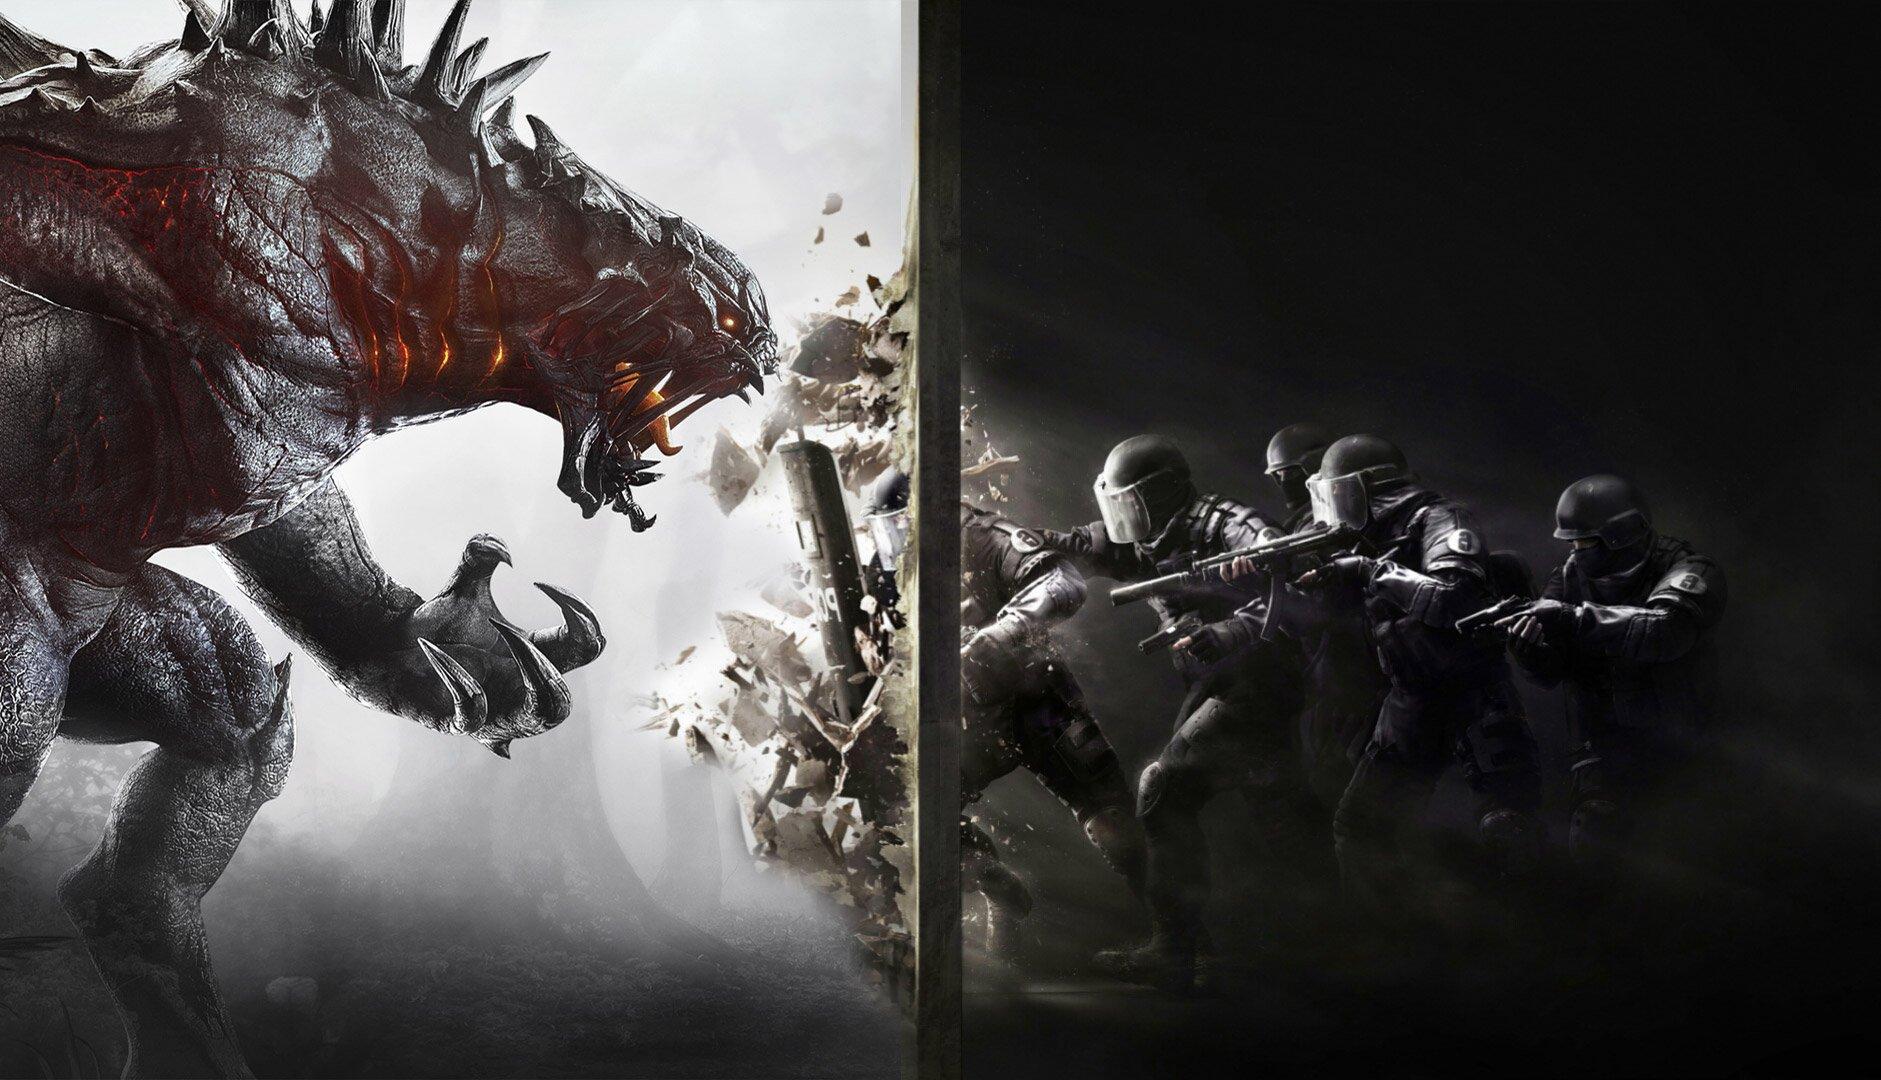 Evolve vs Siege circa. 2015